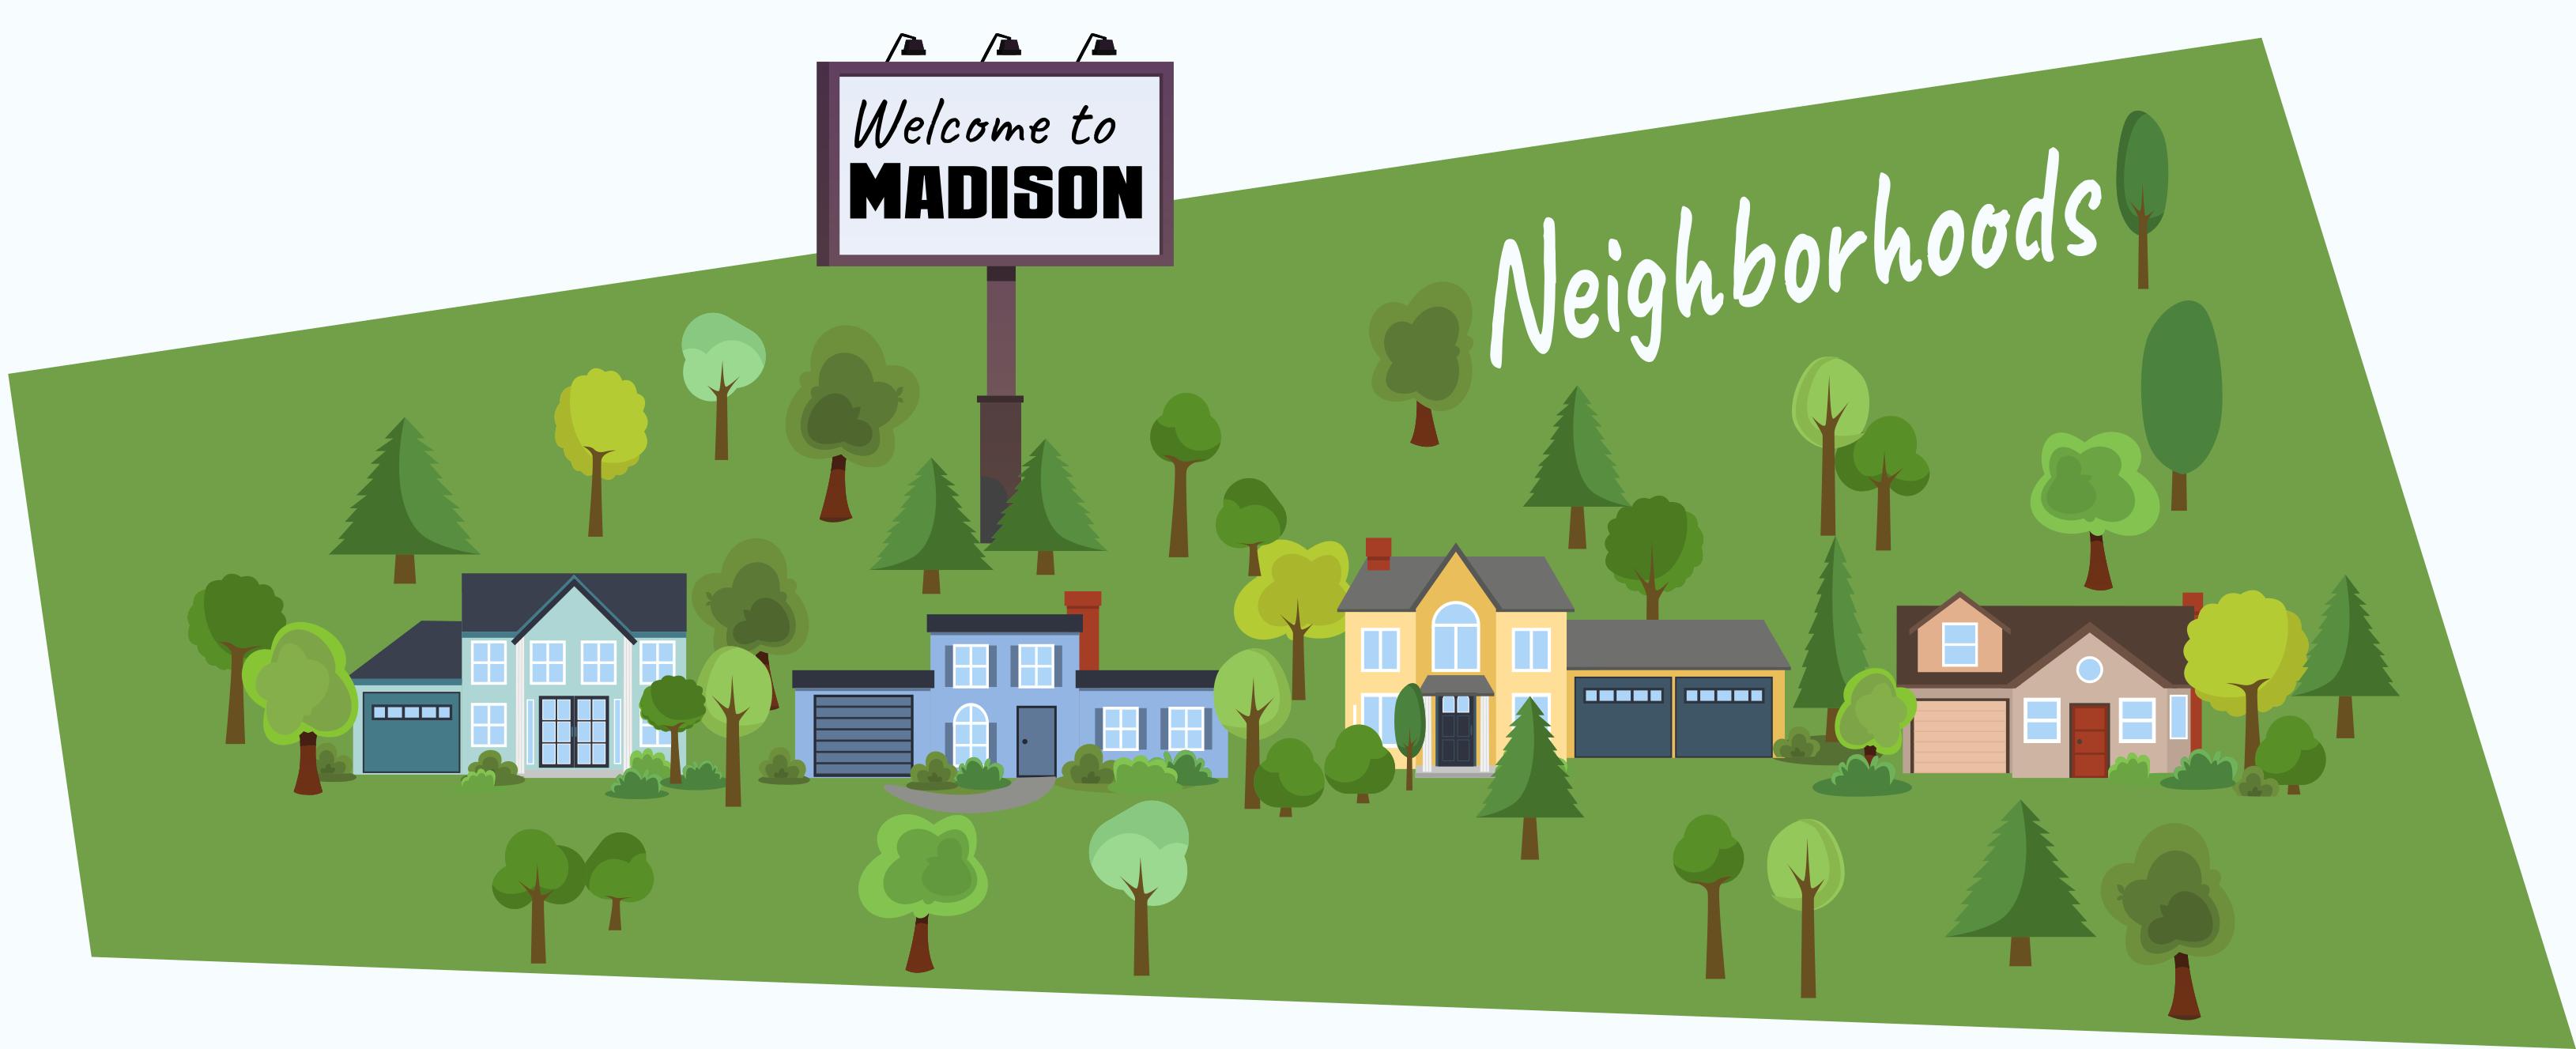 The neighobrhoods of Madison, WI